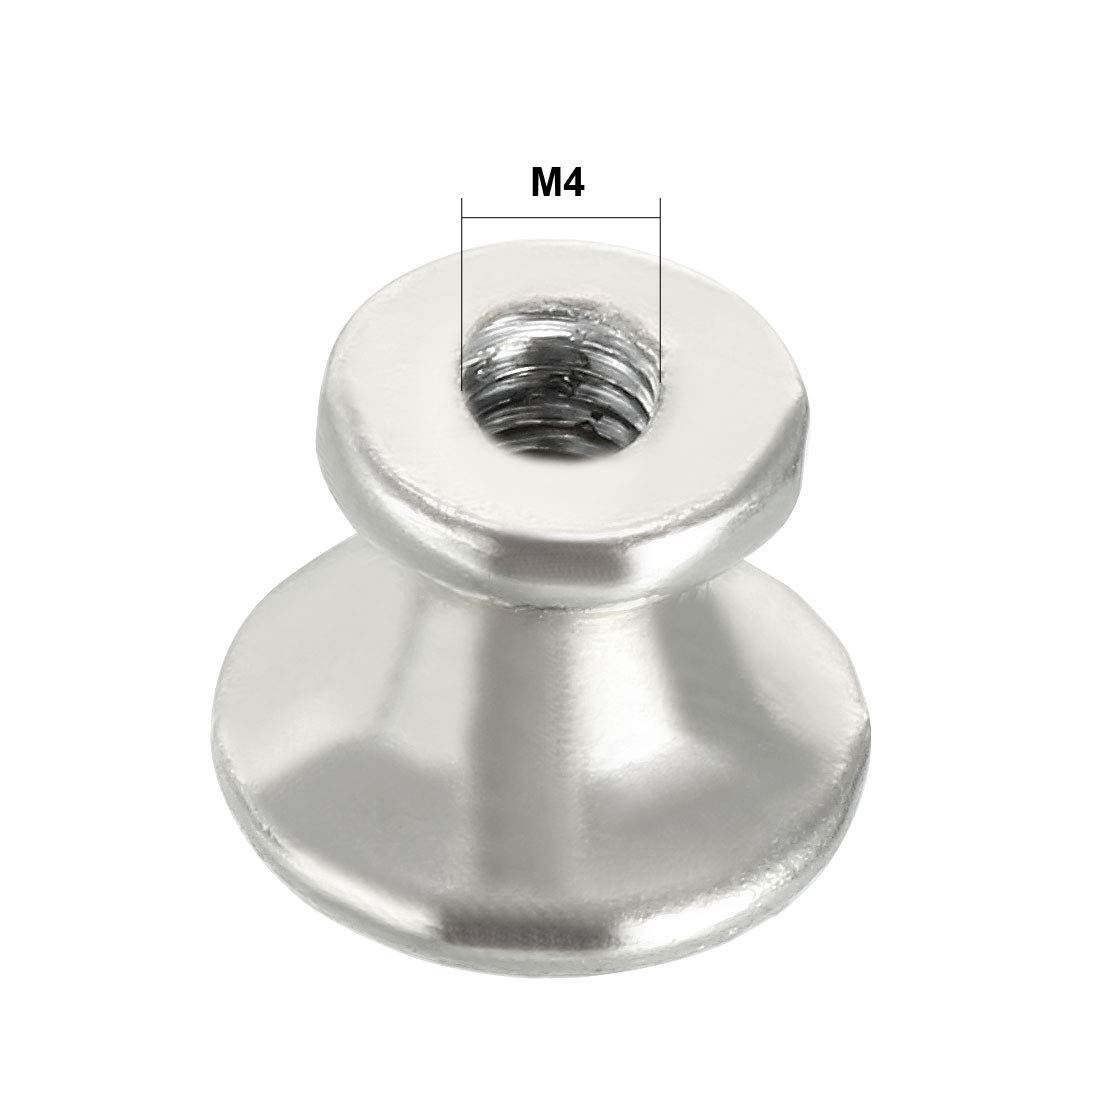 uxcell 25mmx19mm Drawer Single Hole Zinc Alloy Round Knob Pull Handle Black 2pcs a18012000ux0054